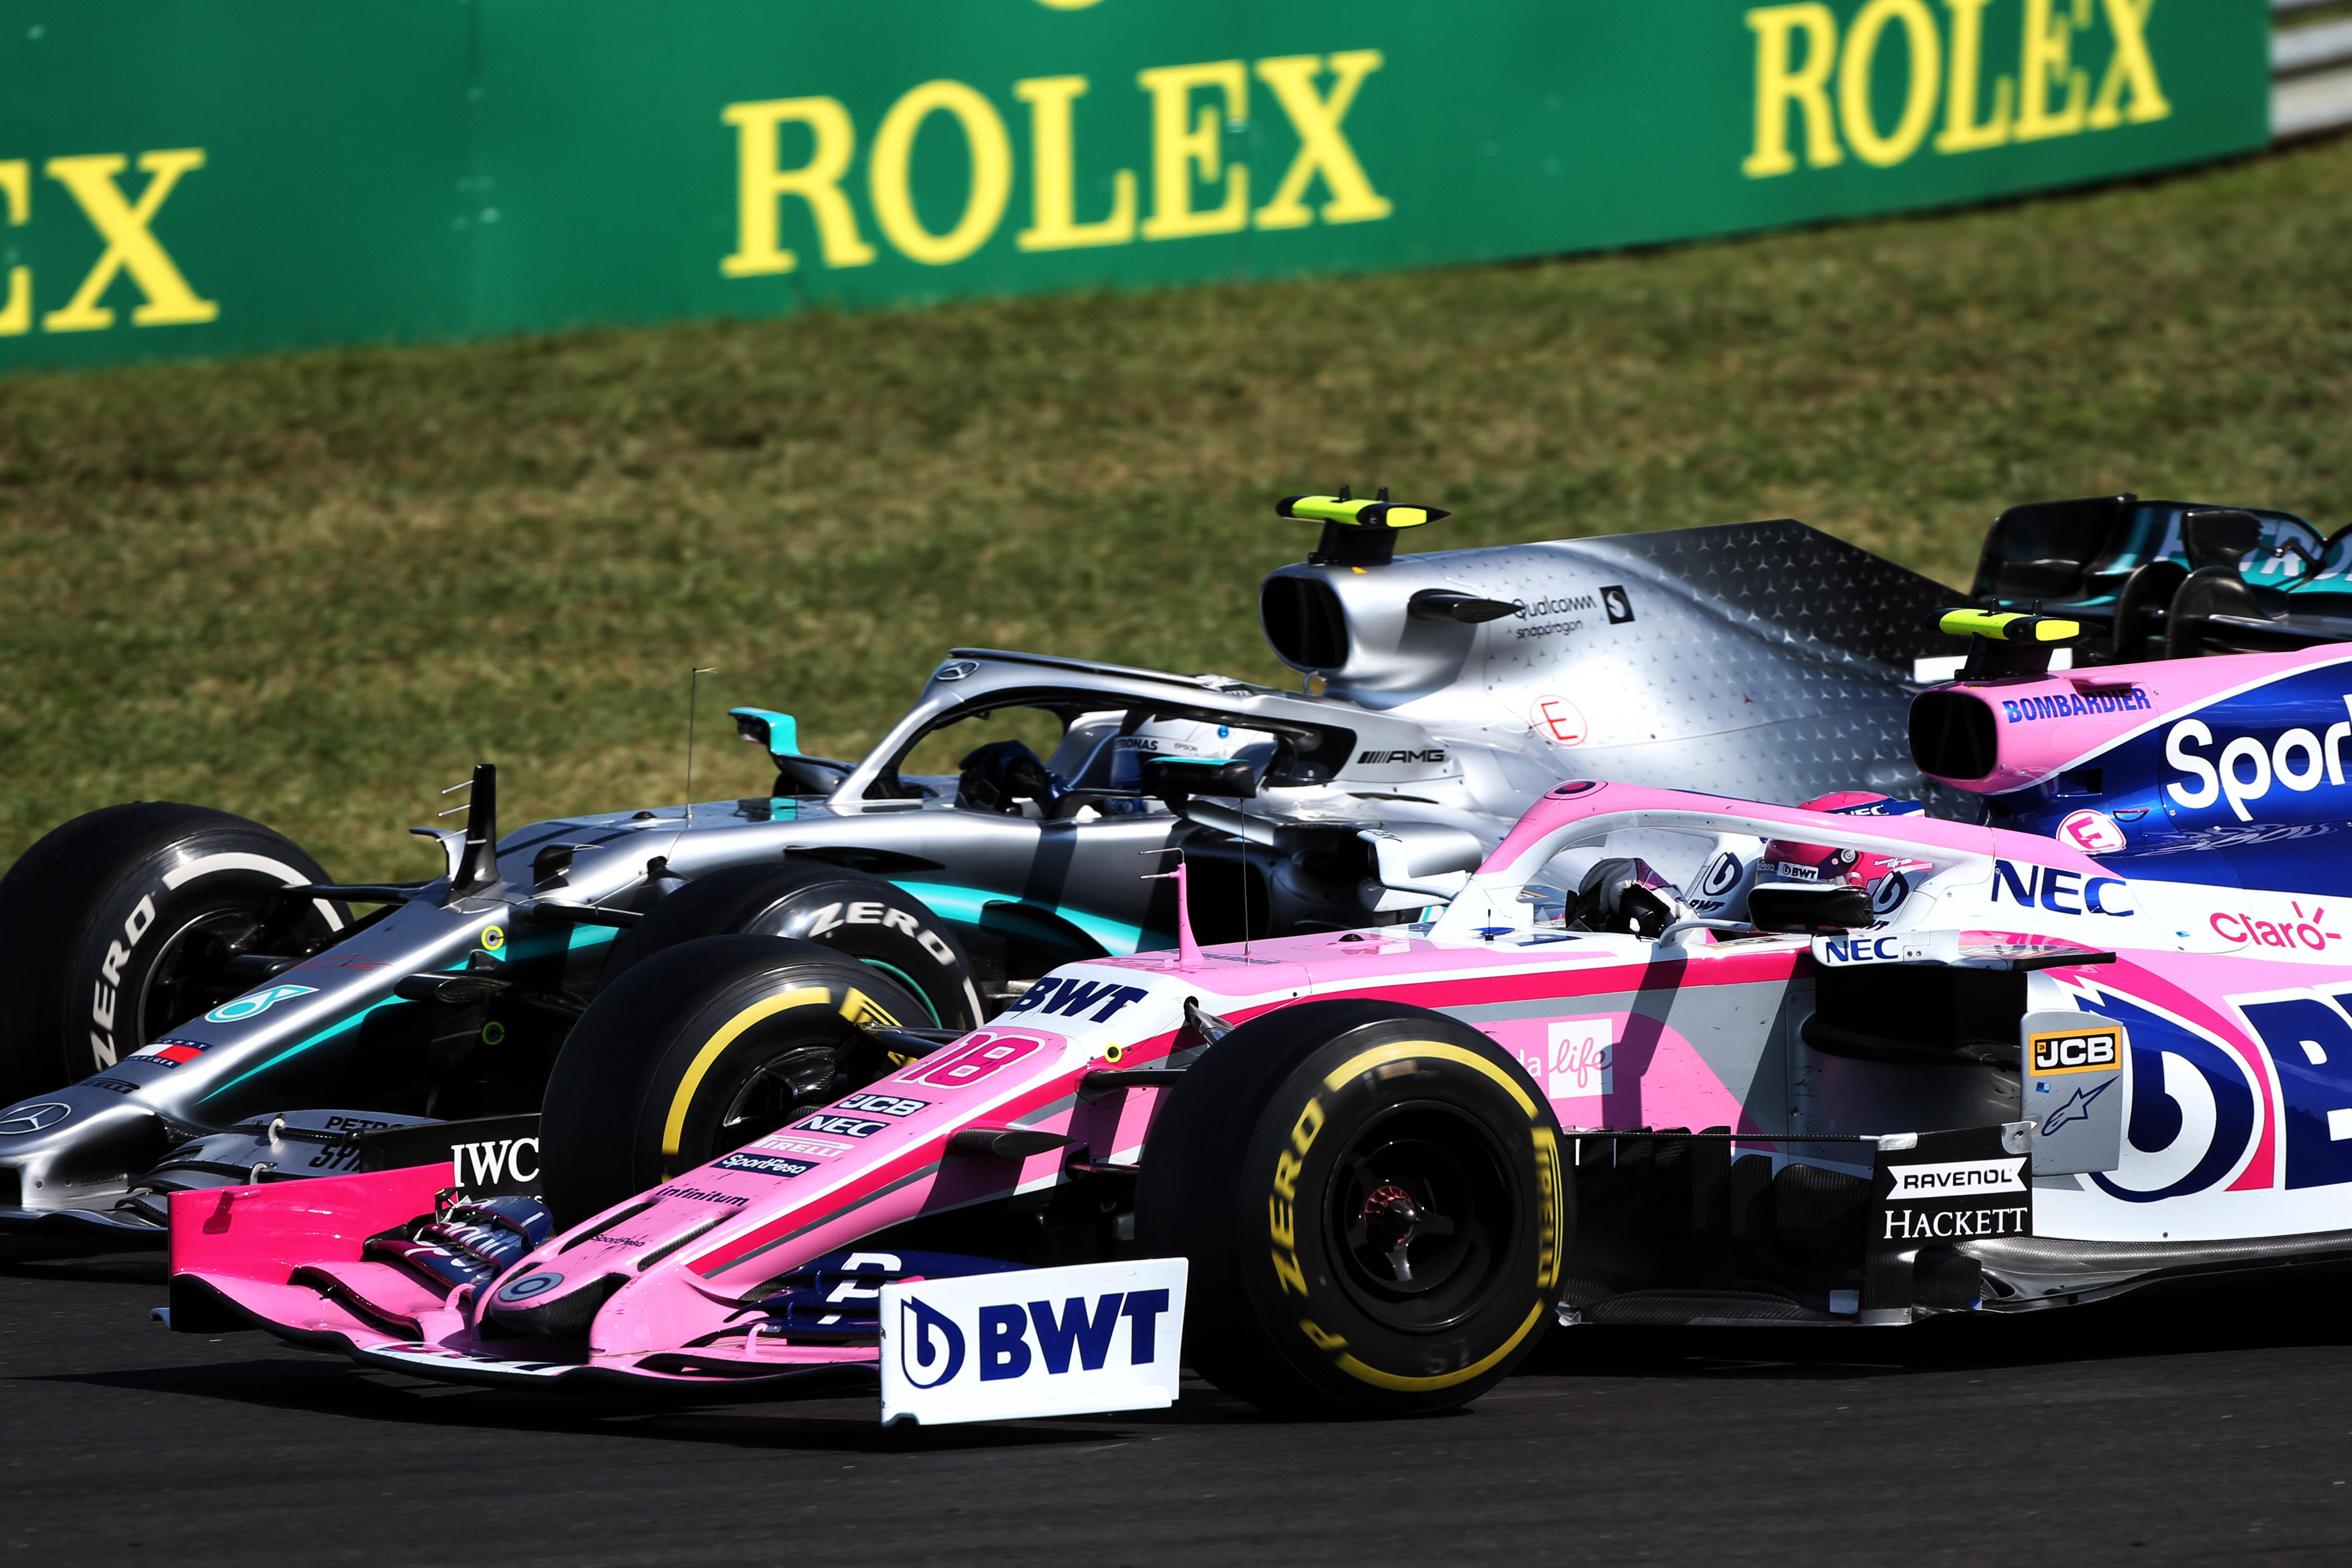 Racing Point Mercedes Hungarian Grand Prix 2019